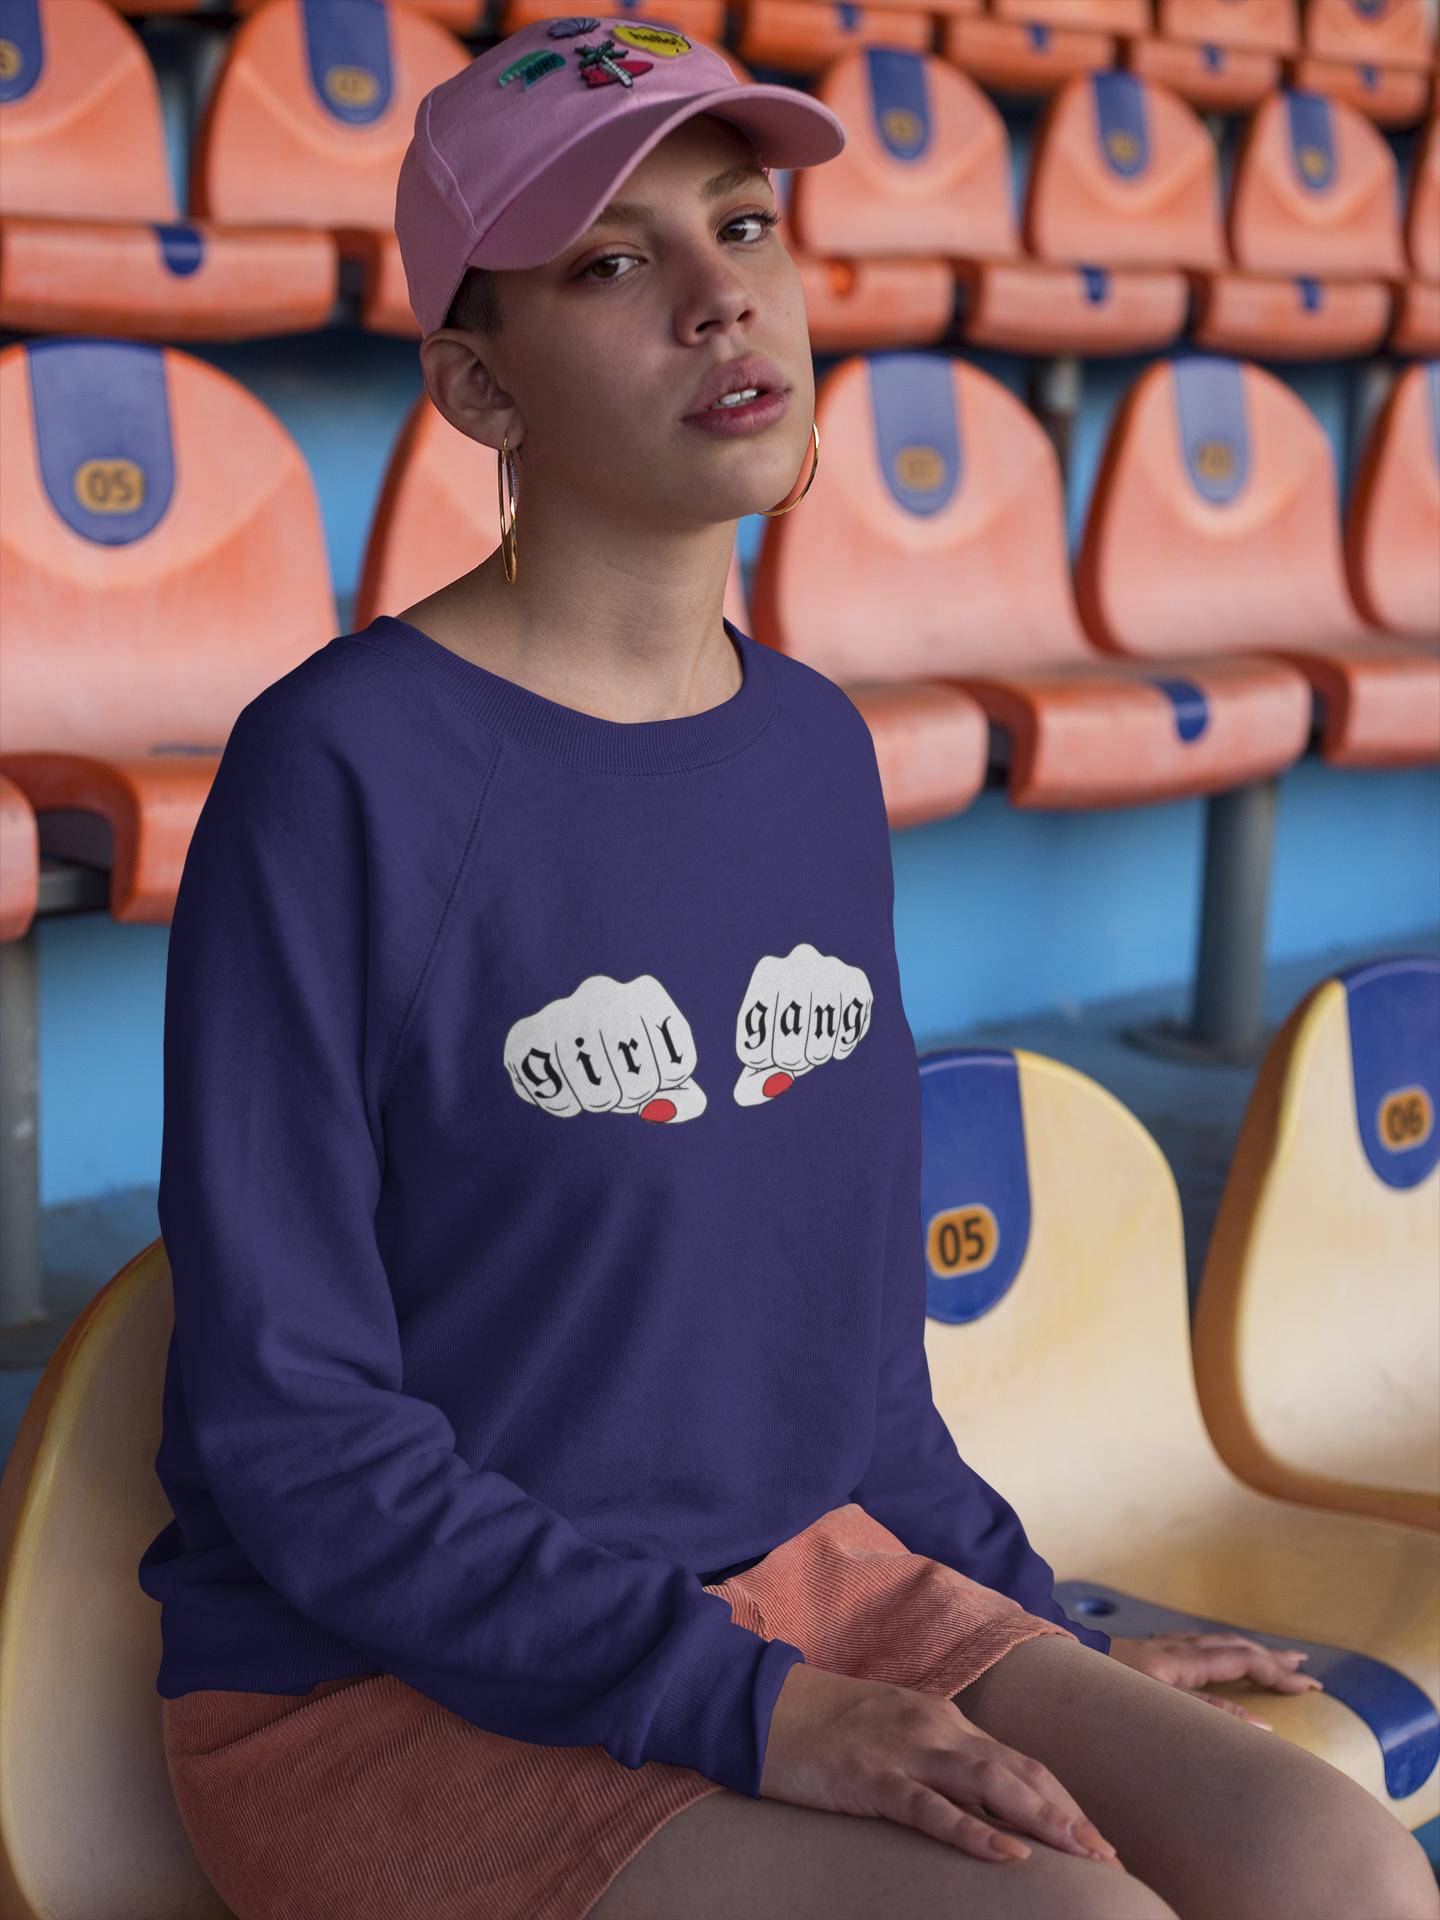 girl-wearing-a-crewneck-sweatshirt-mocku